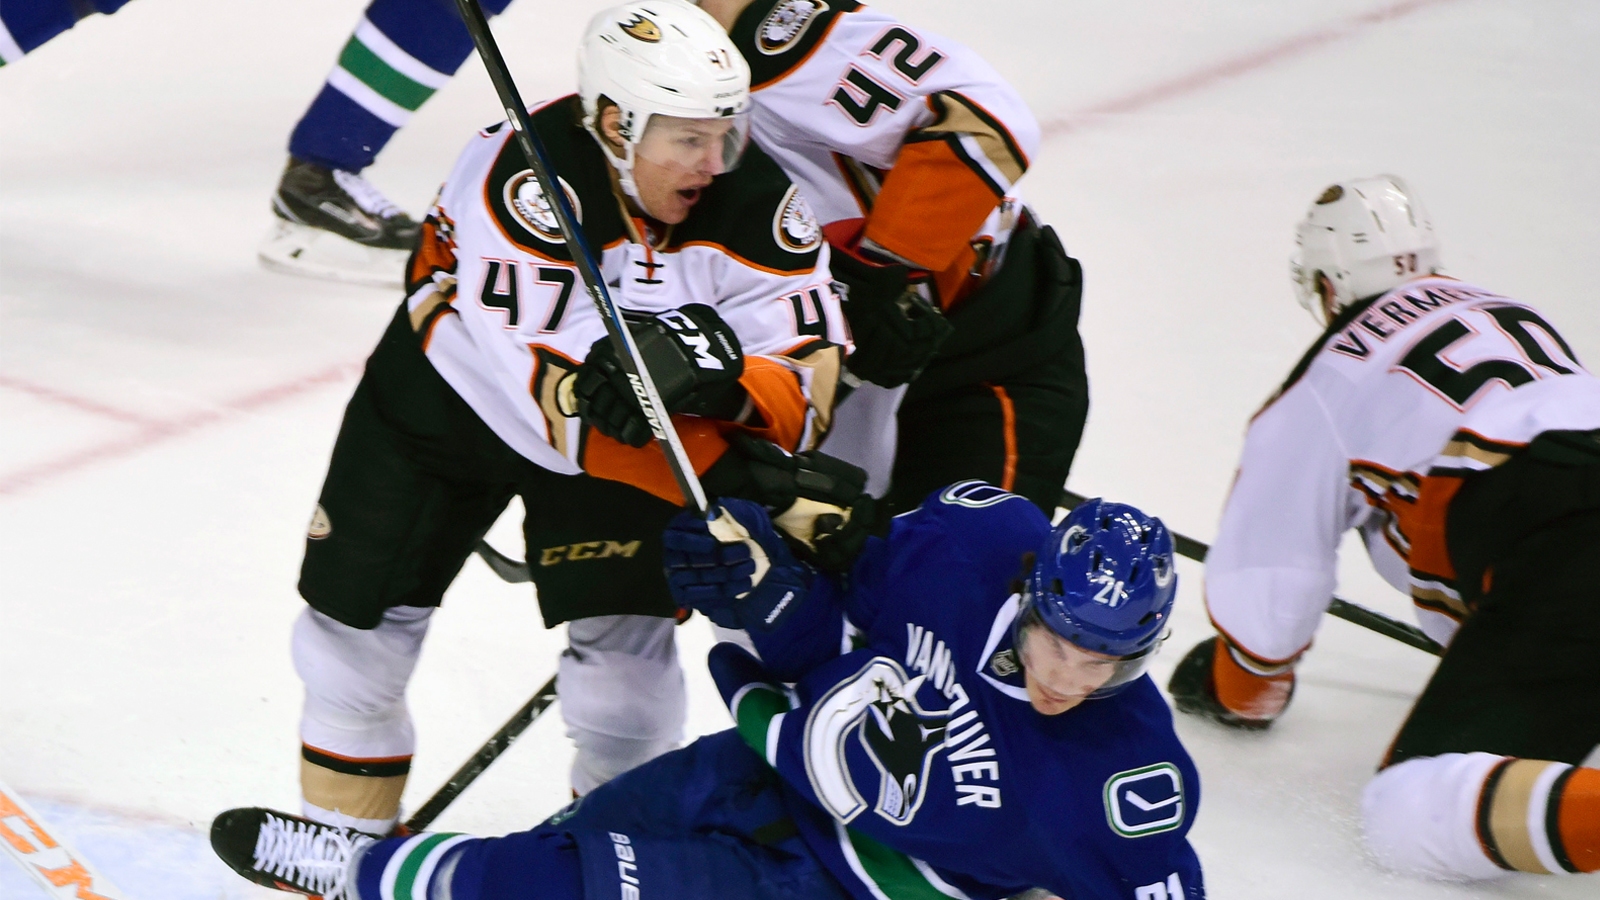 Ducks visit Canucks for second-half push